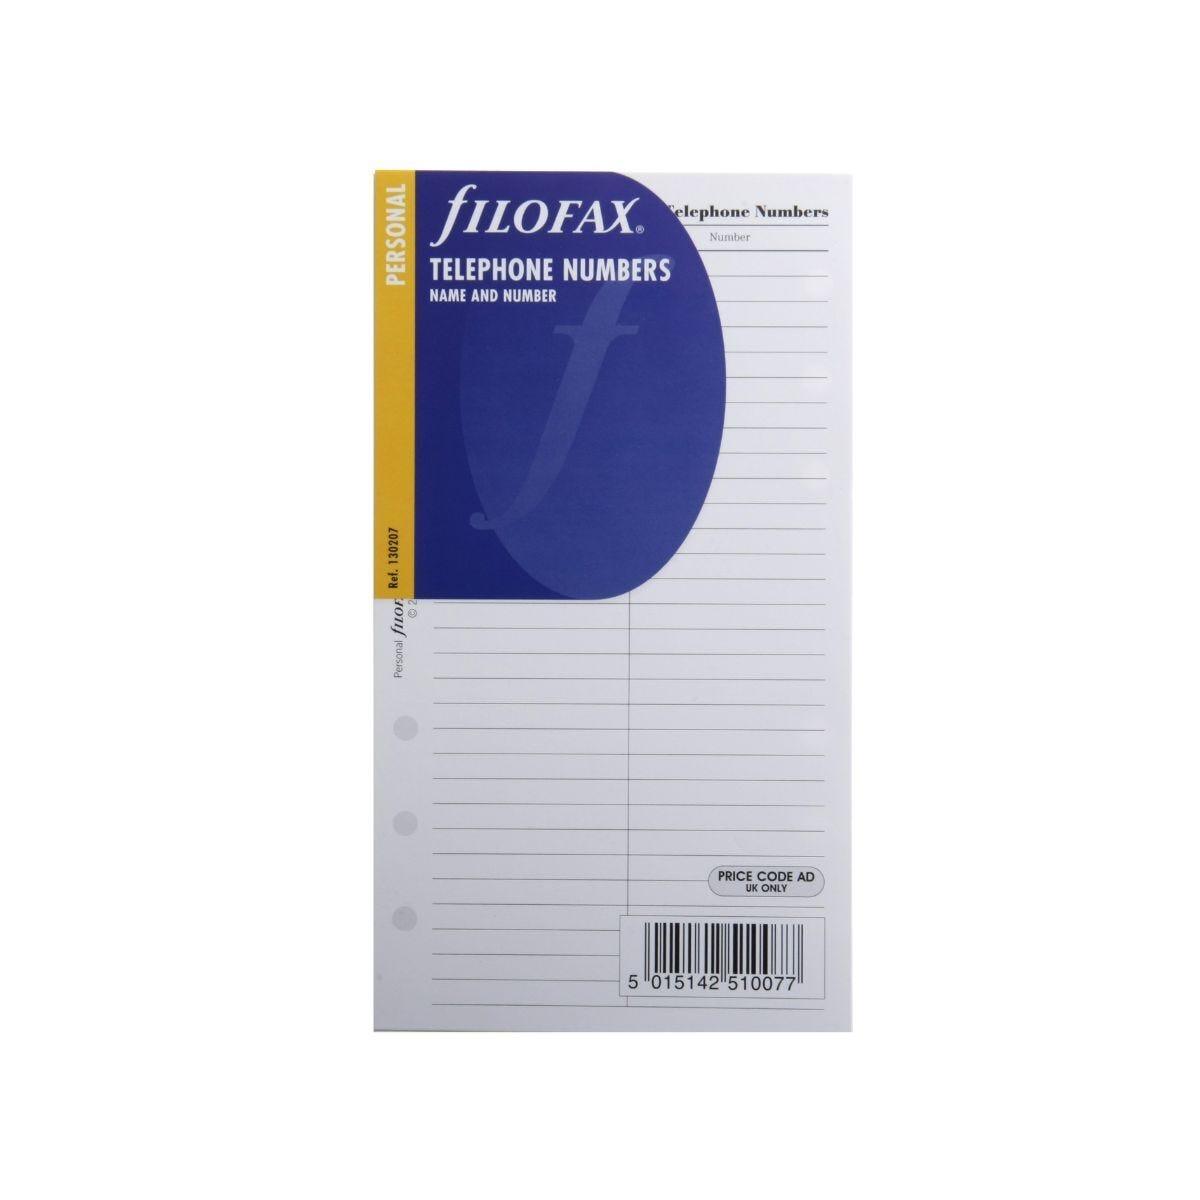 Filofax Refill Personal Name and Telephone